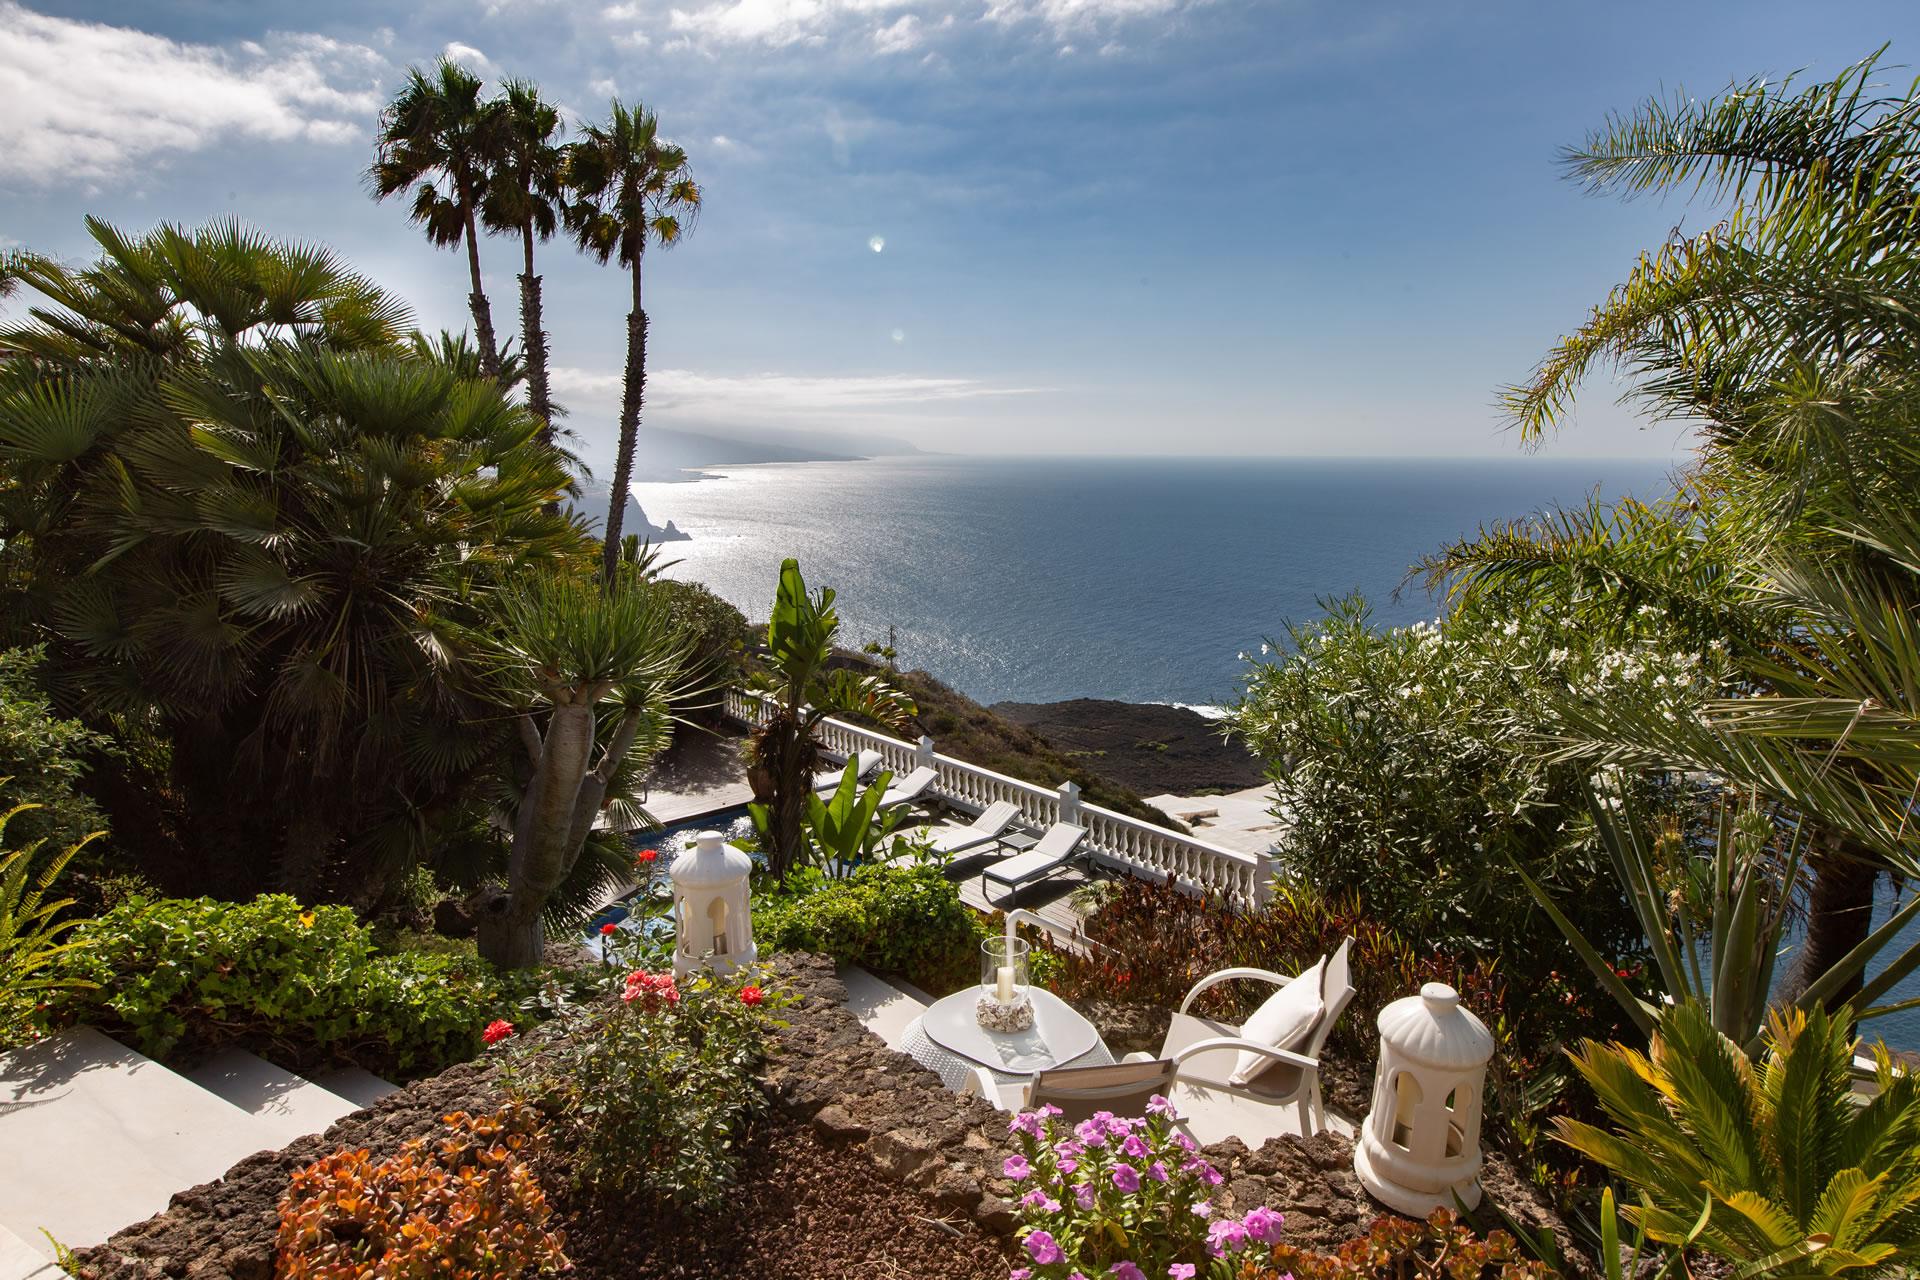 Casa Primavera im Jardin de la Paz: Apartment mit Blick auf das Meer